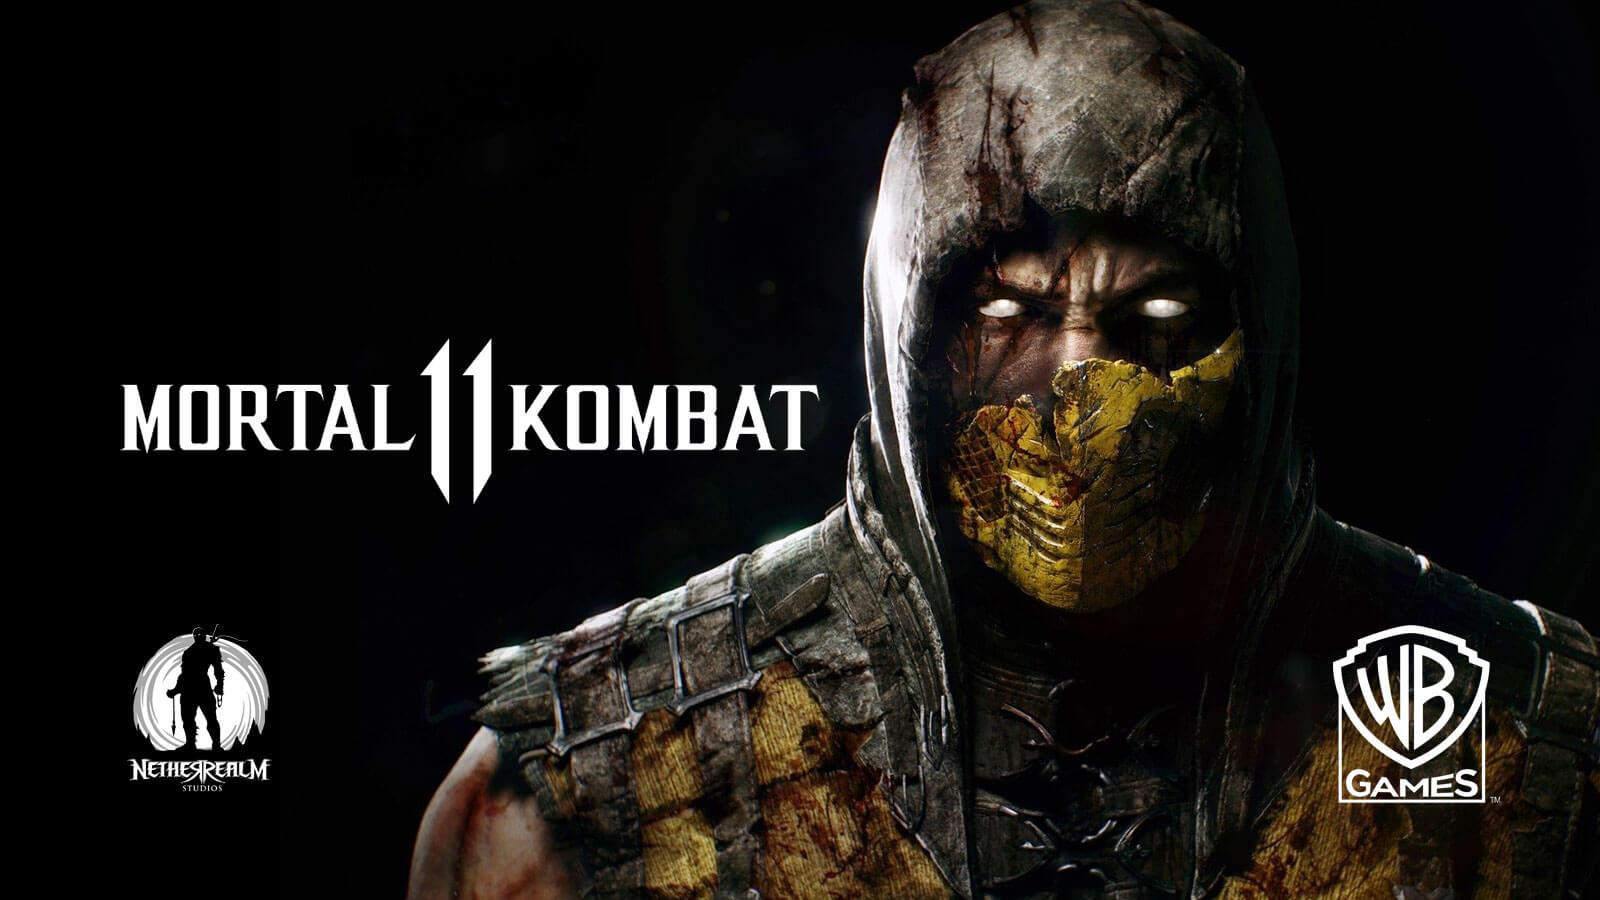 mortal kombat 11 - photo #7